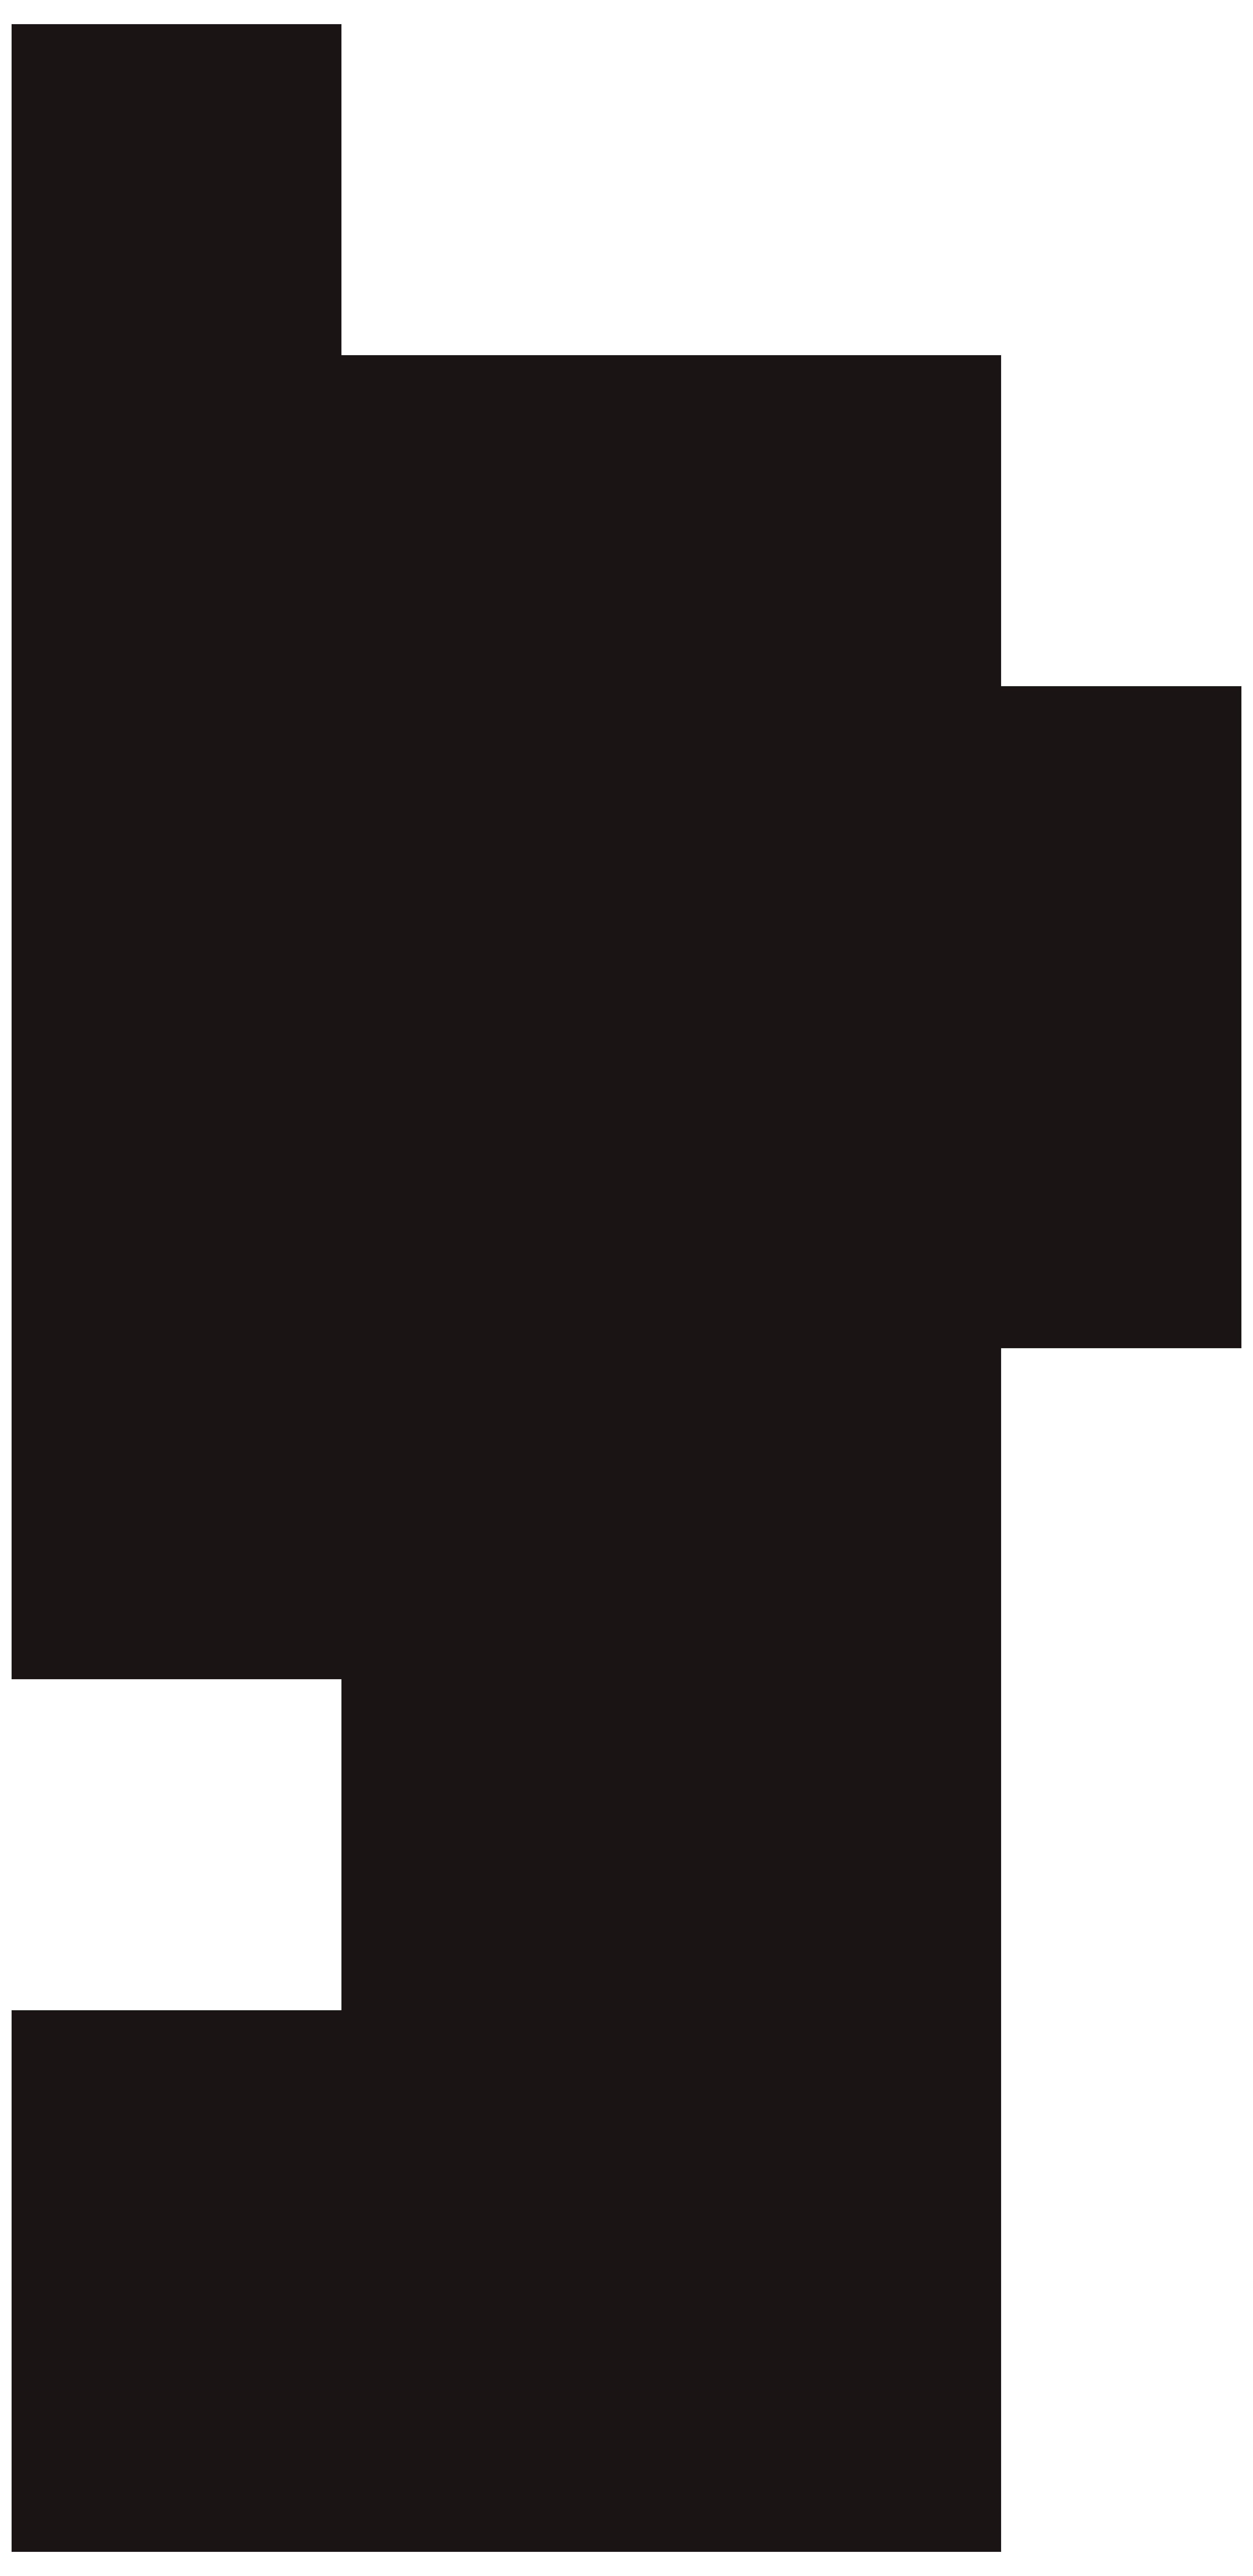 Ballet clipart transparent Silhouette PNG size Image View